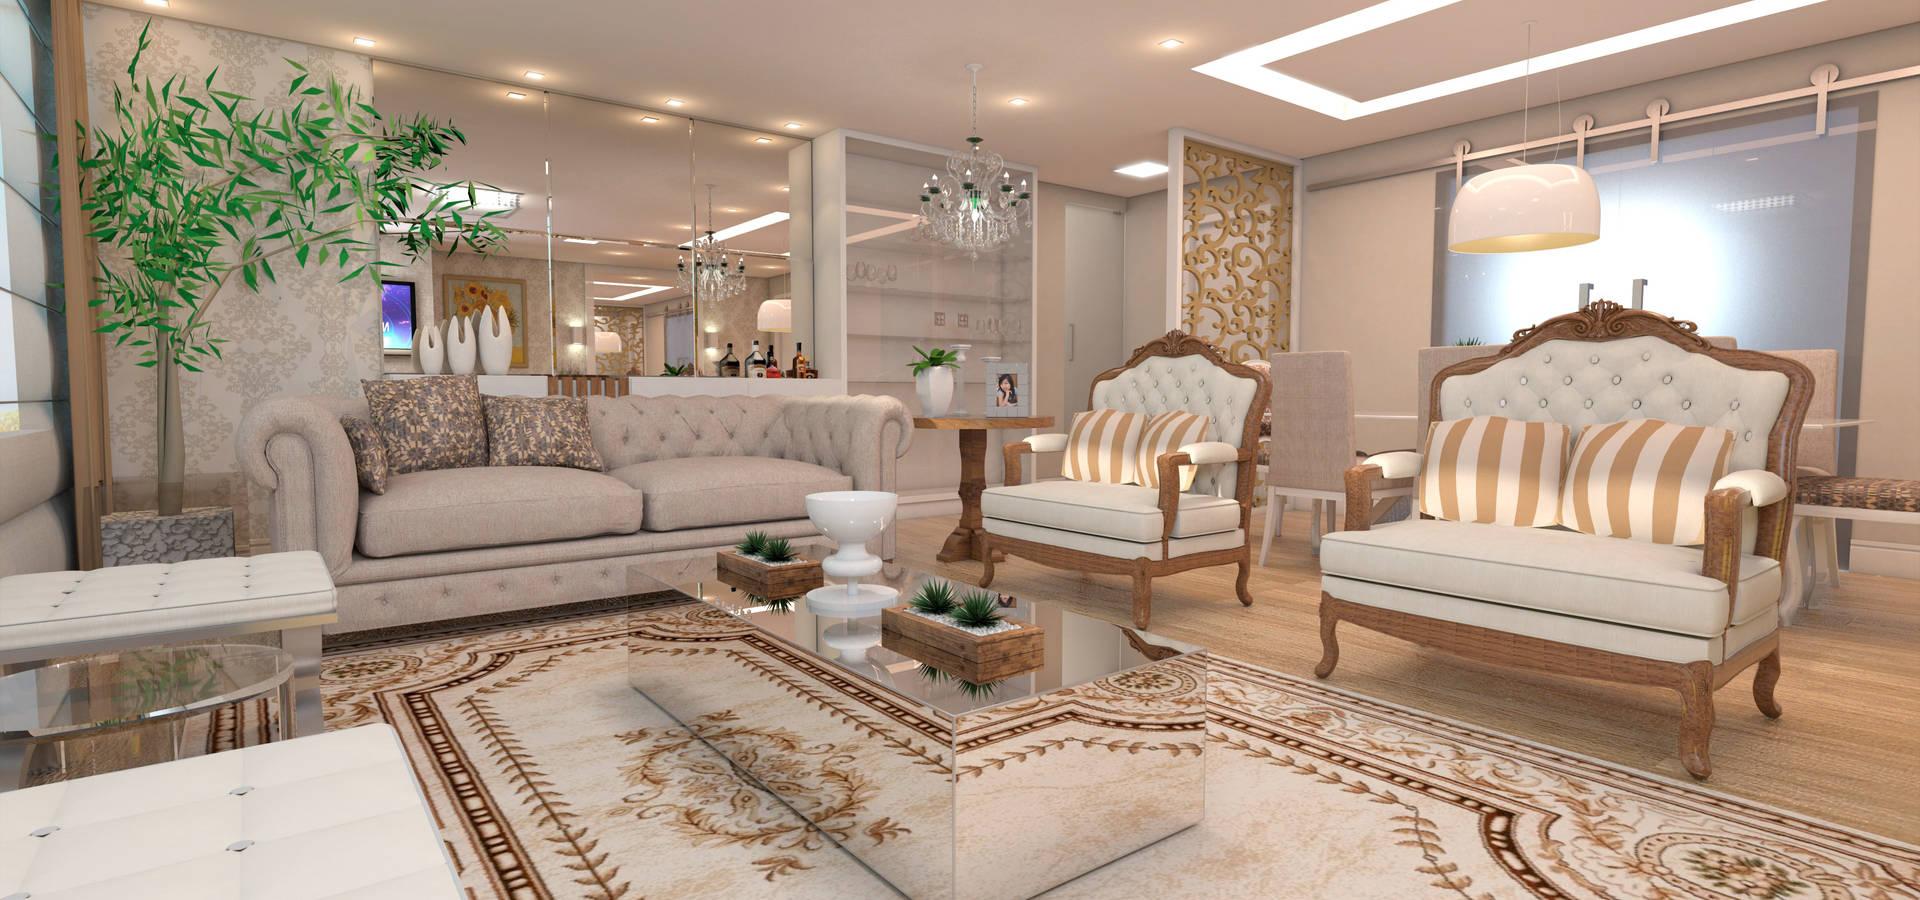 Giovana Lumertz Design de Interiores